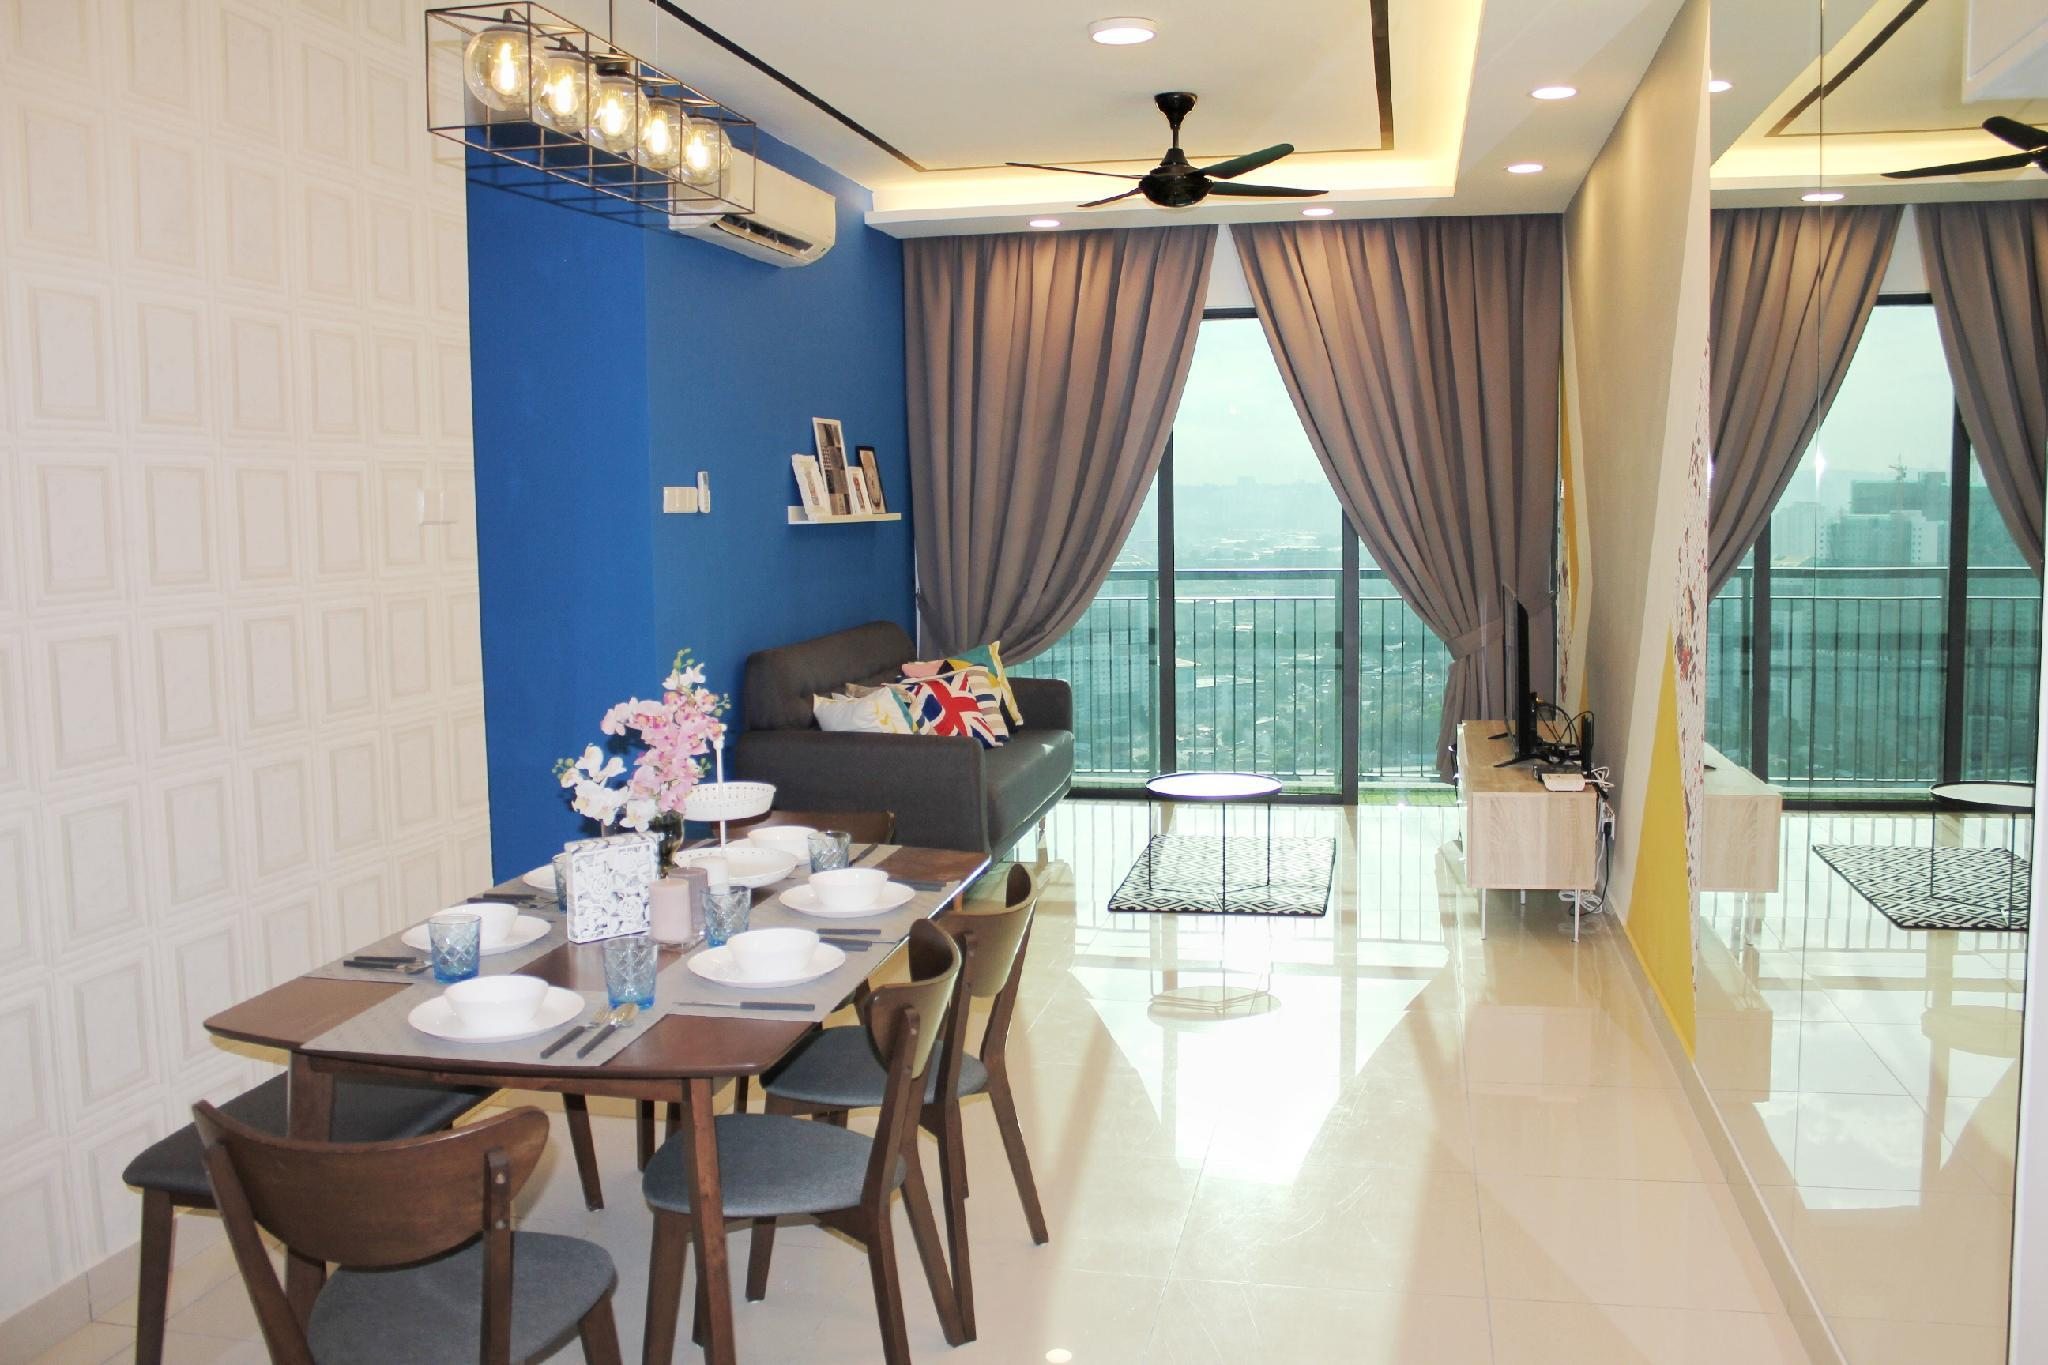 Contemporary Cozy Home@KL  4 8pax  8 Min To KLCC